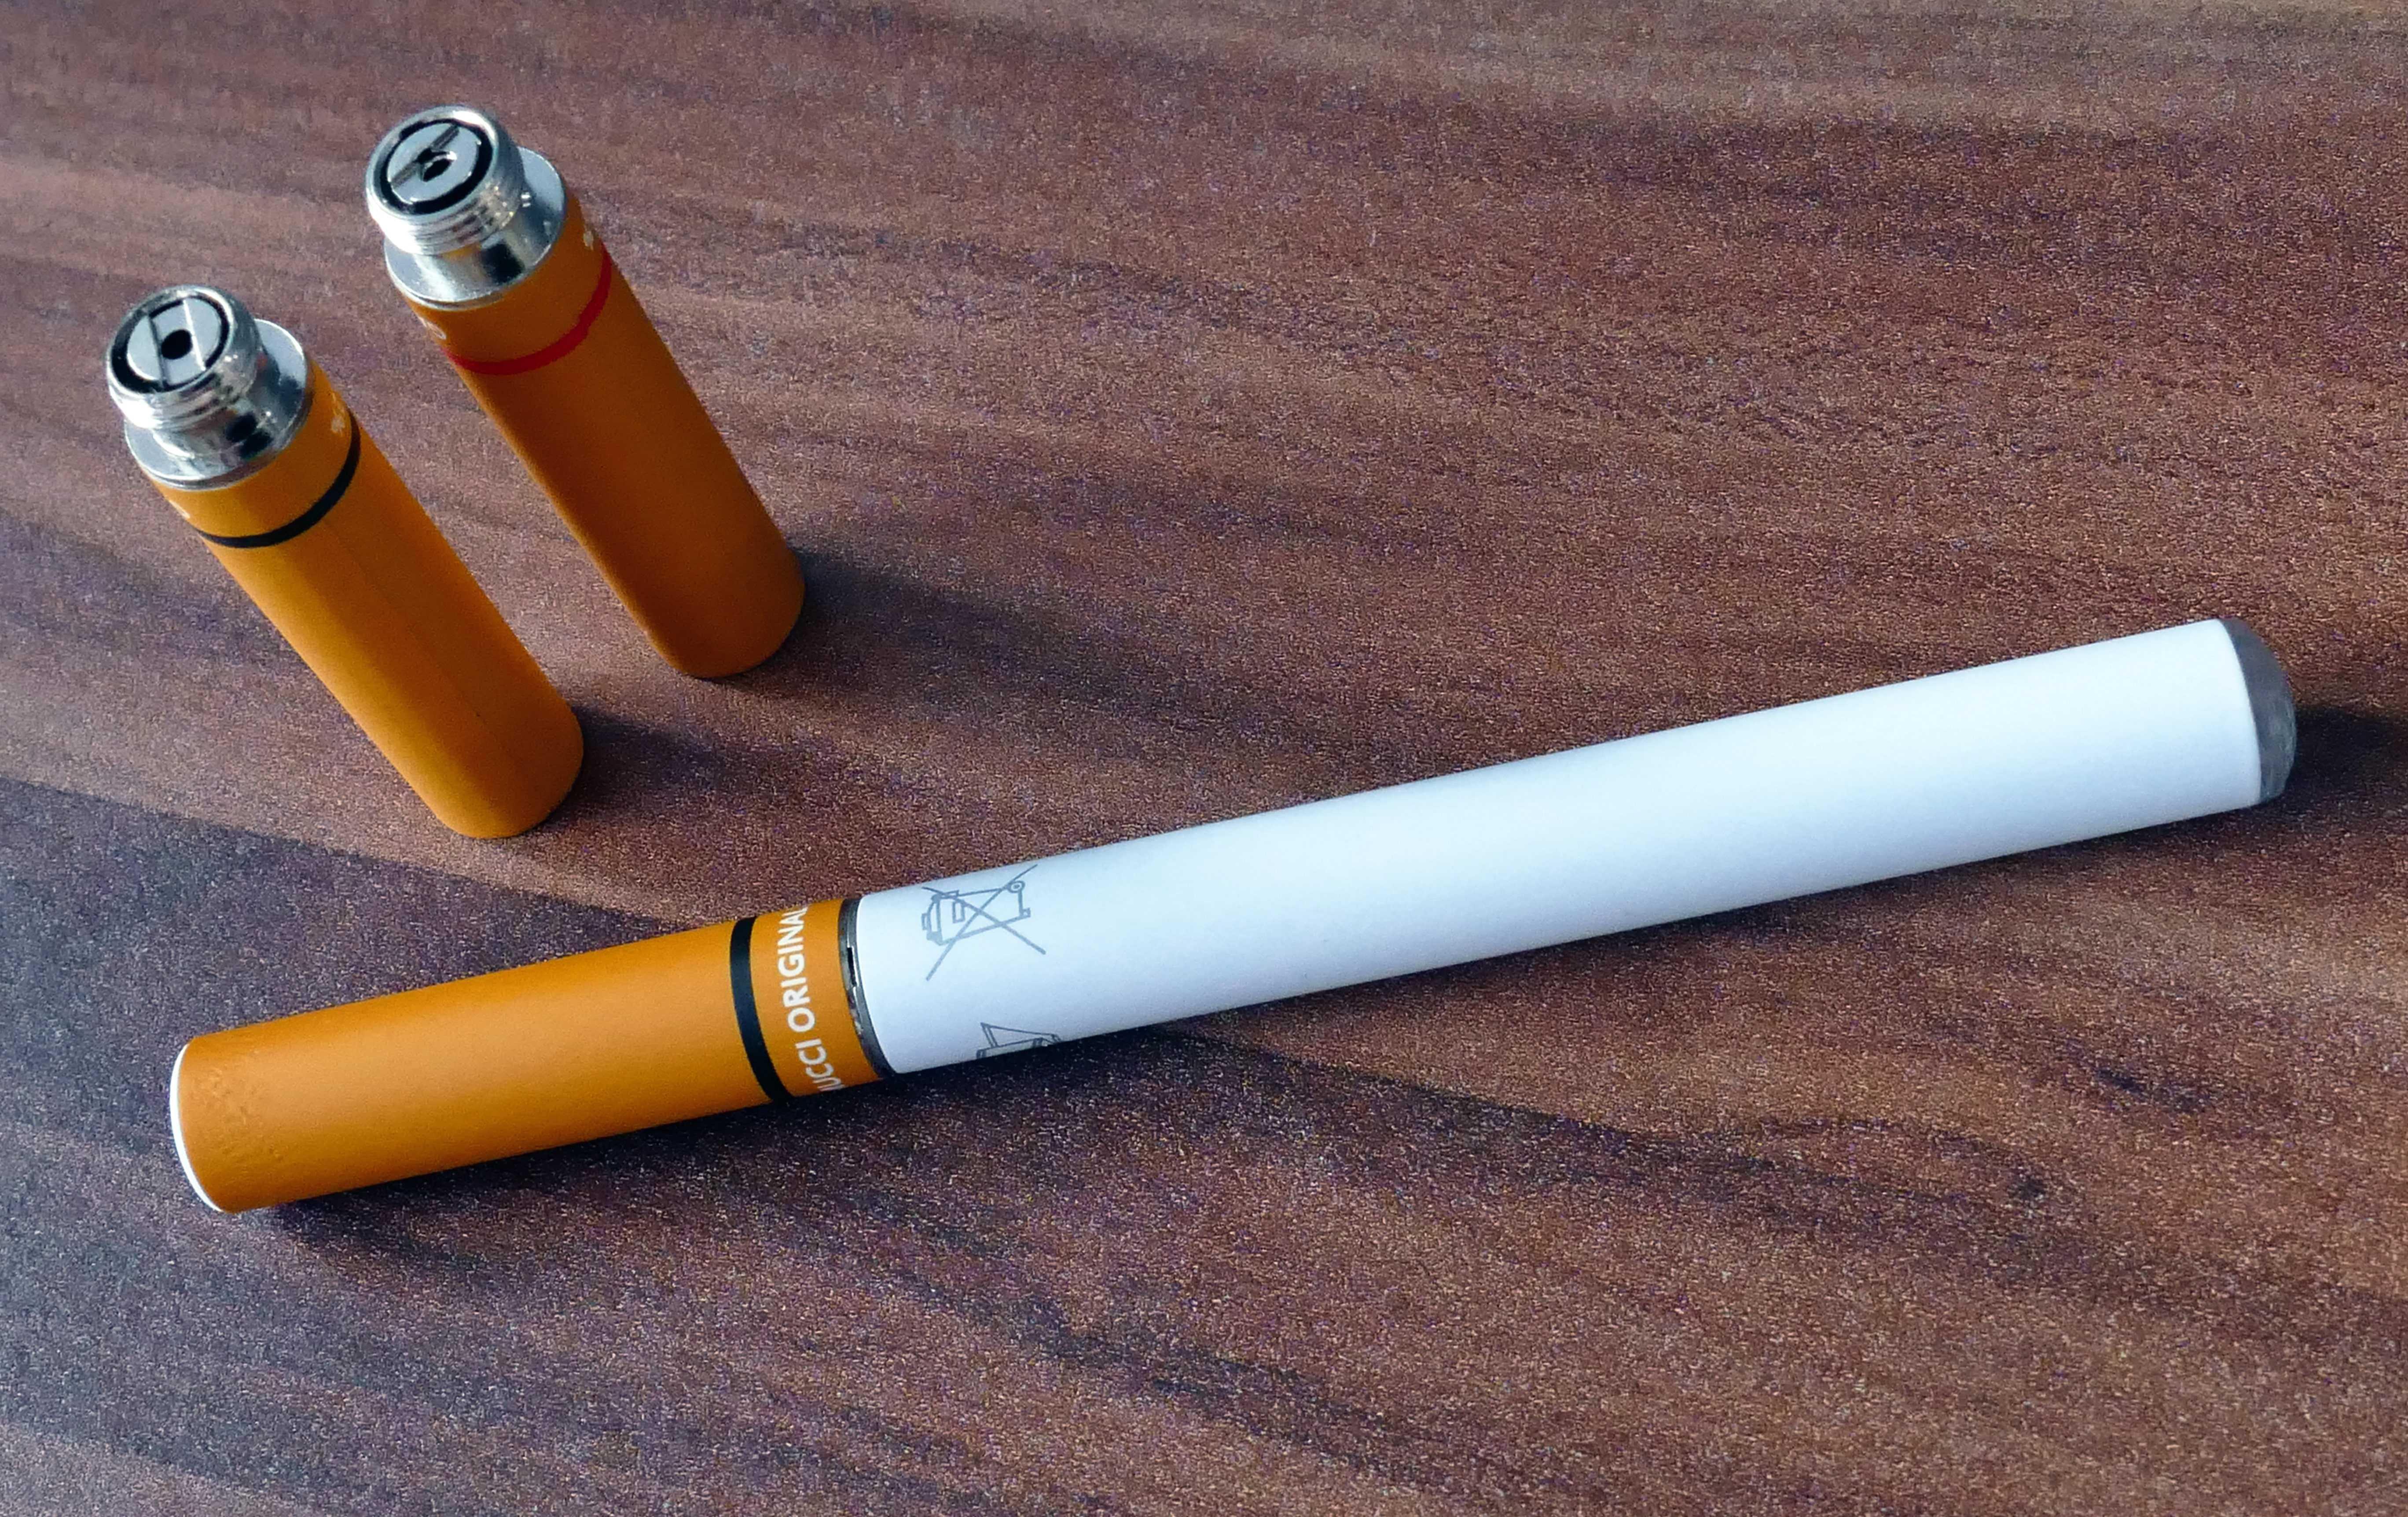 Design Zigarette Bild